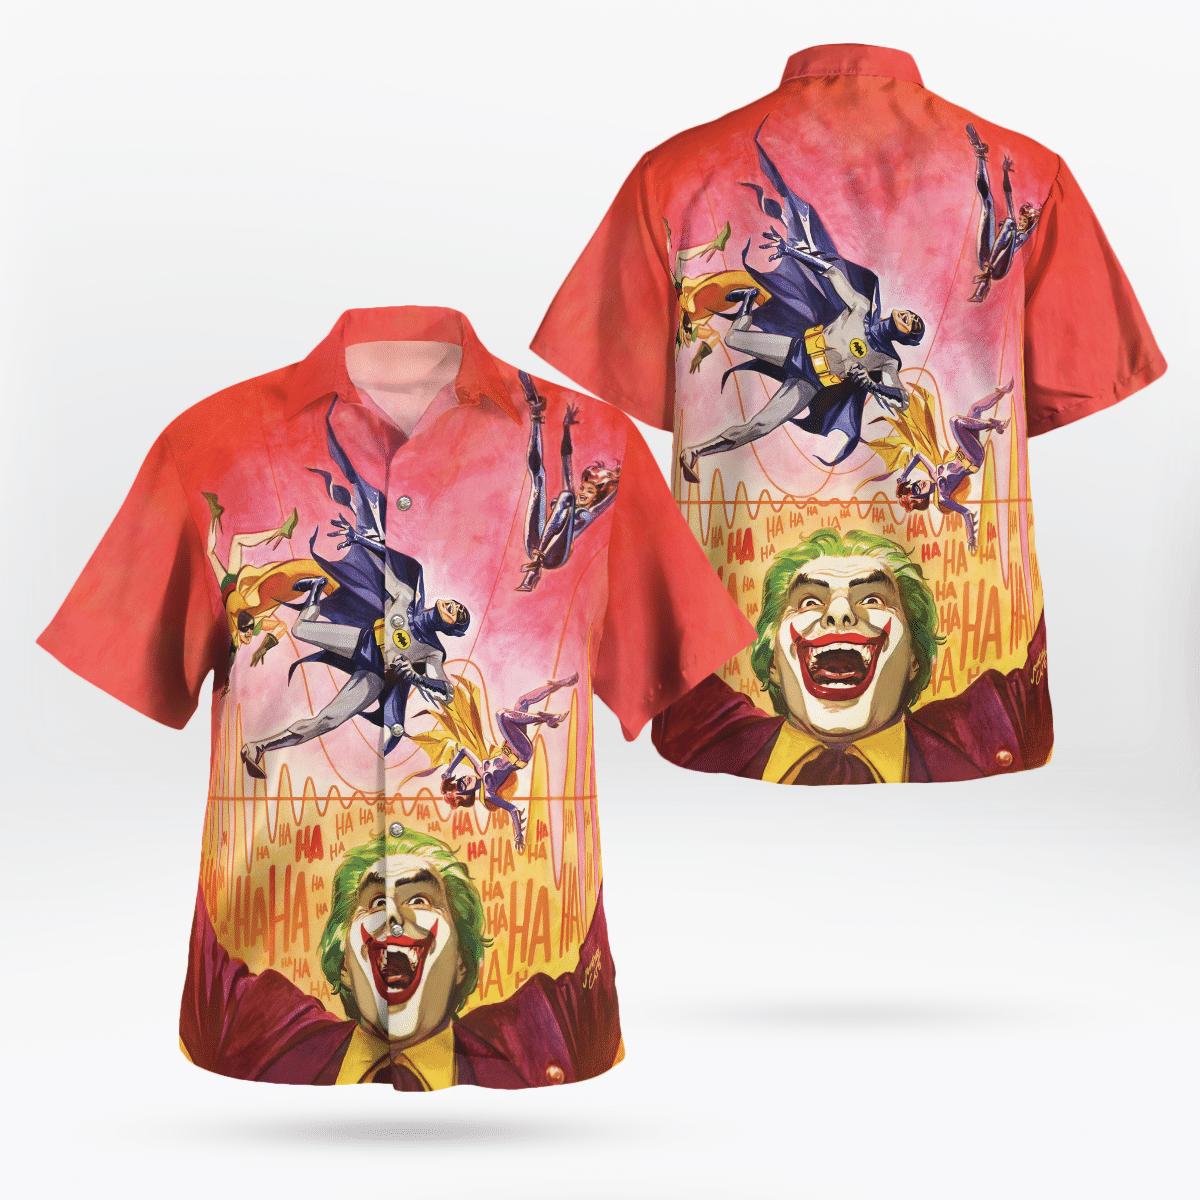 Batman 66 with Joker Hawaiian Shirt